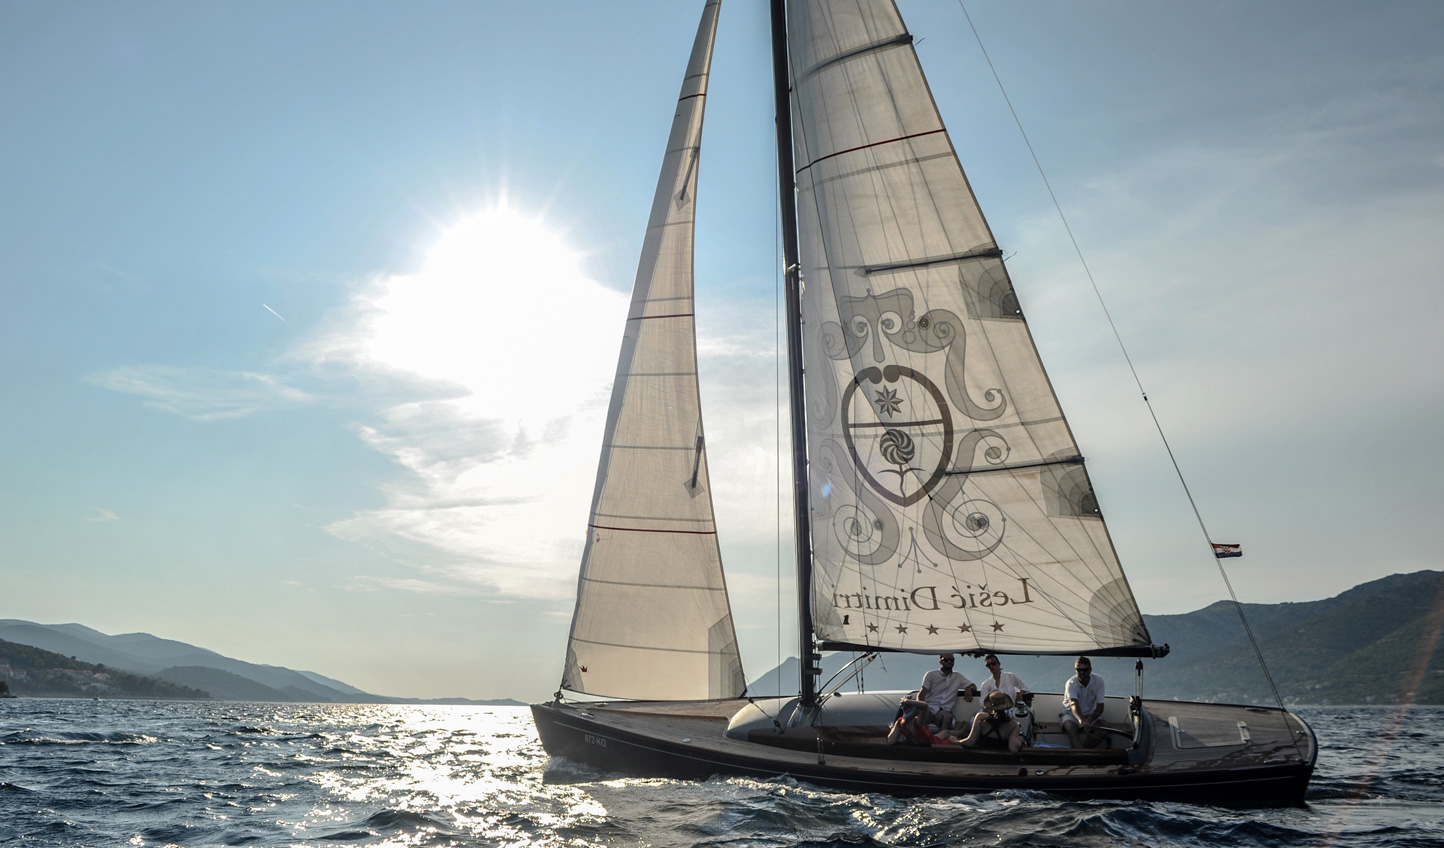 Explore the Adriatic onboard Lešić Dimitri Palace's sail boat